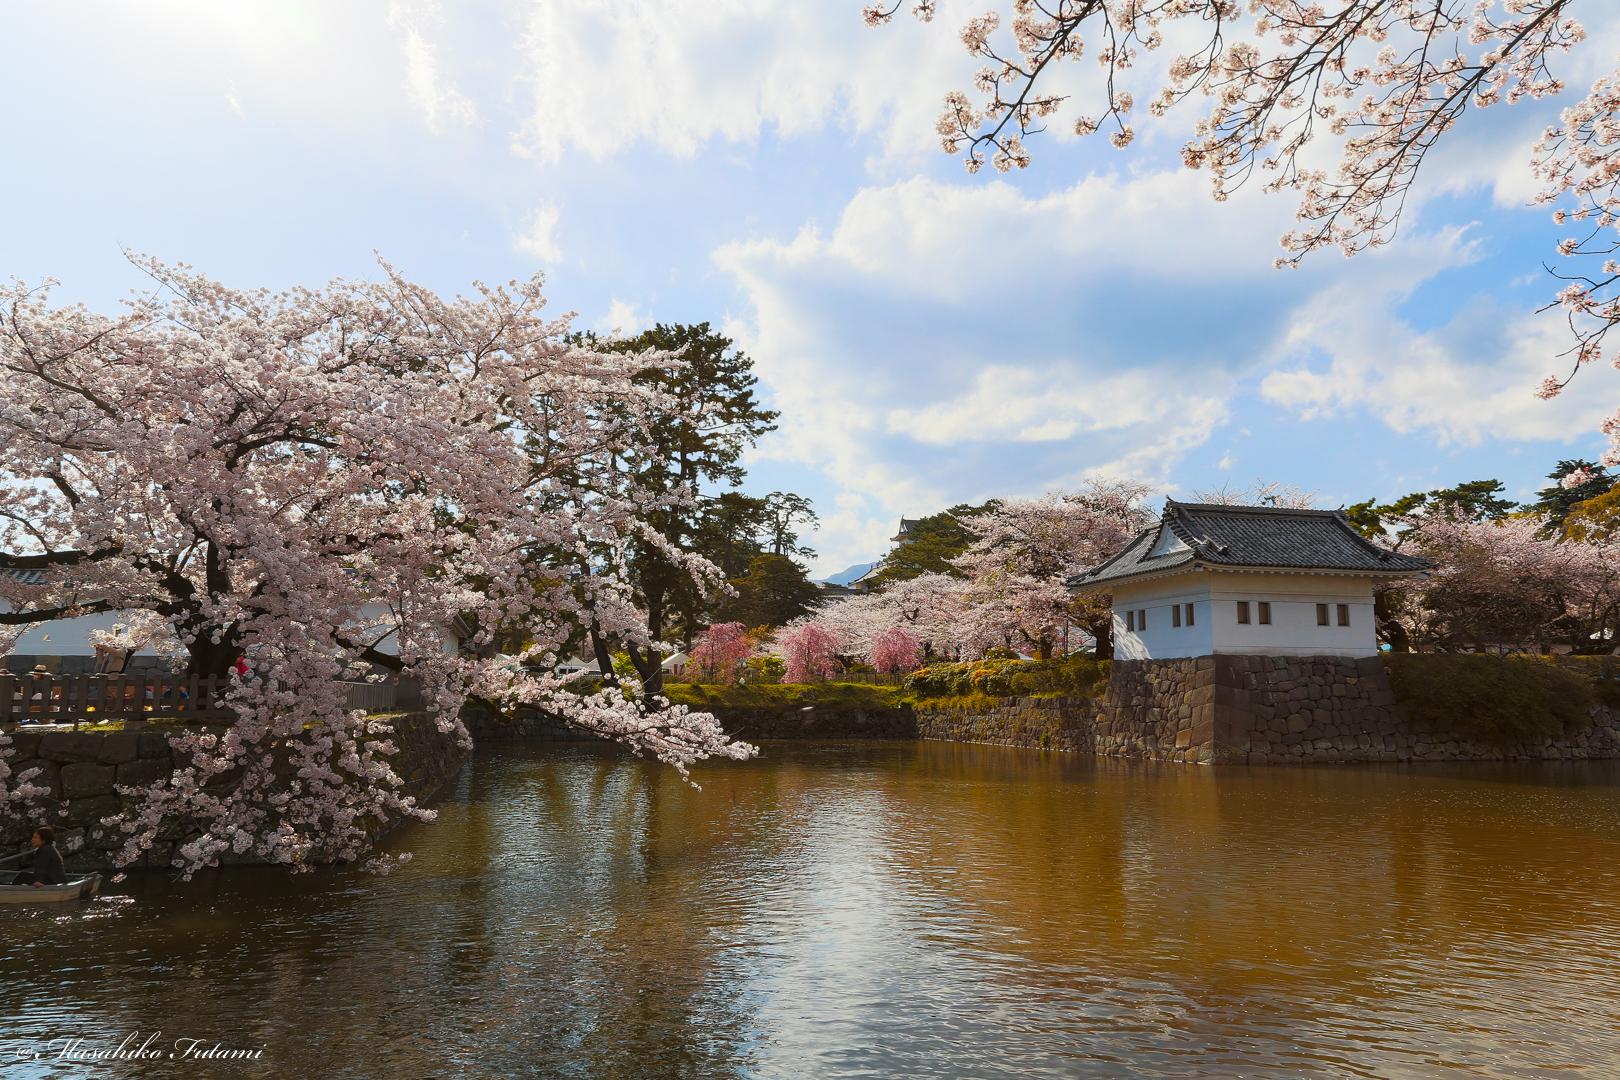 Sakura Landscape